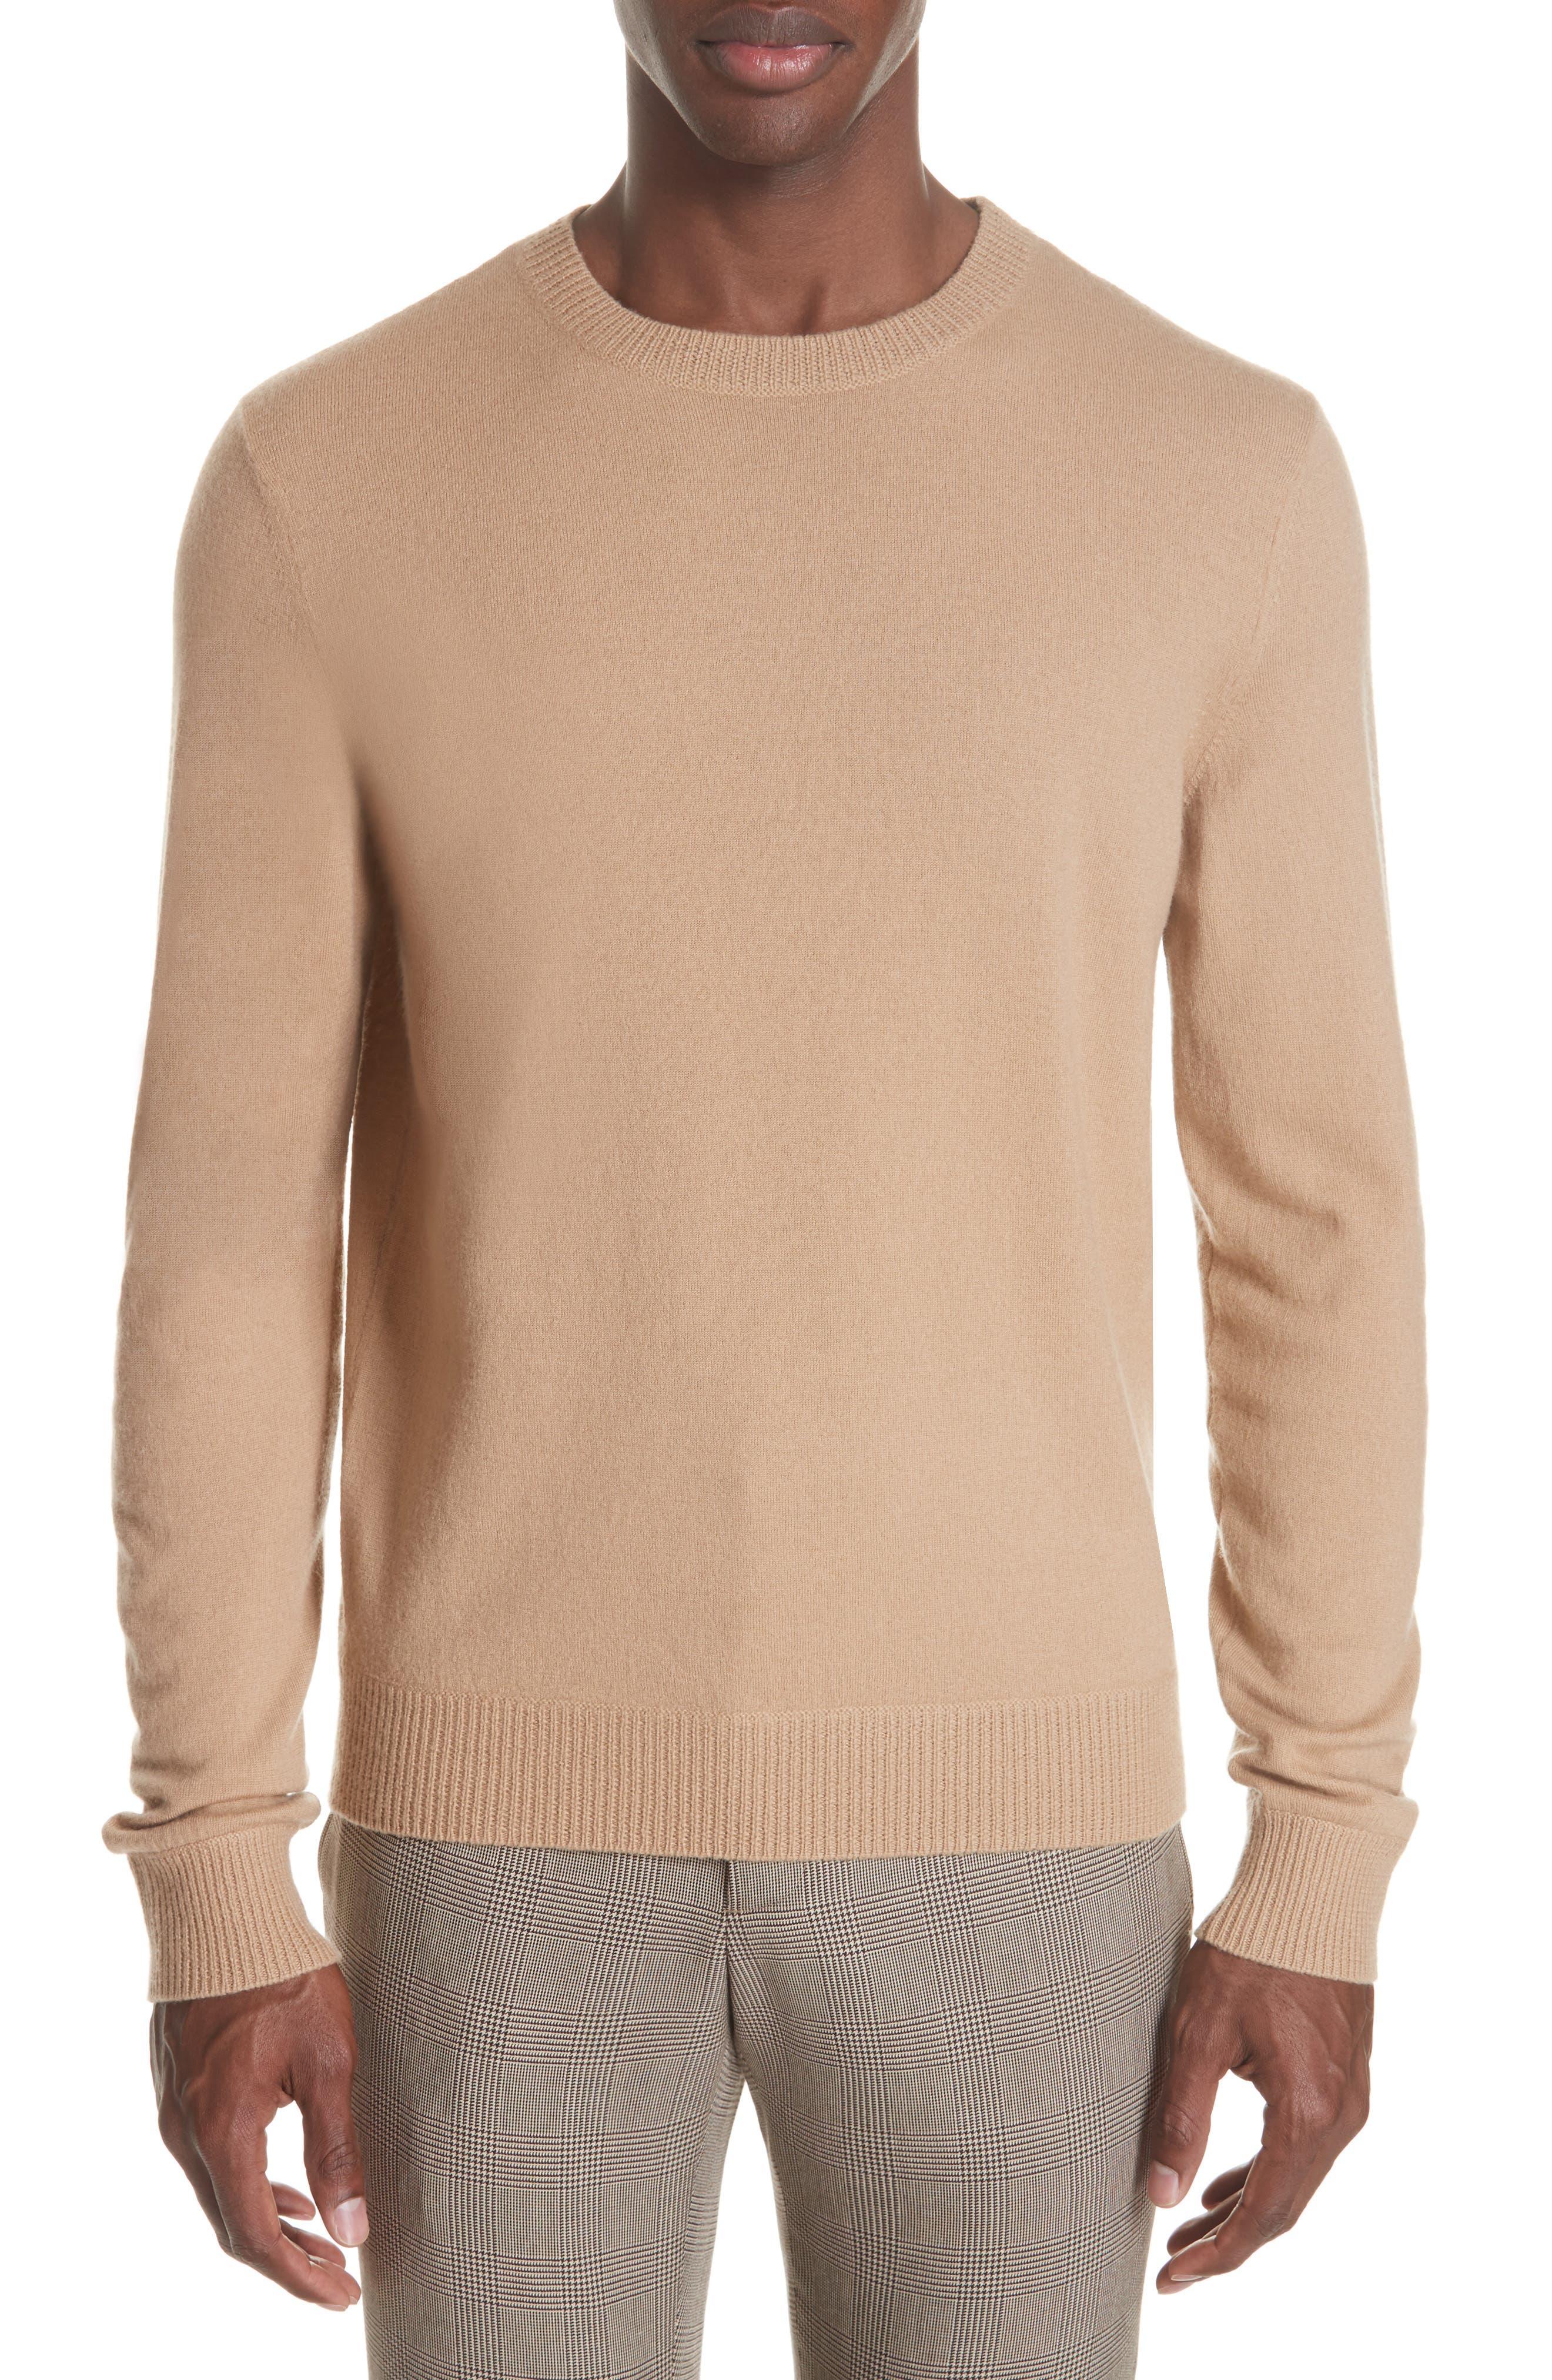 Merino Wool Crewneck Sweater,                             Main thumbnail 1, color,                             240